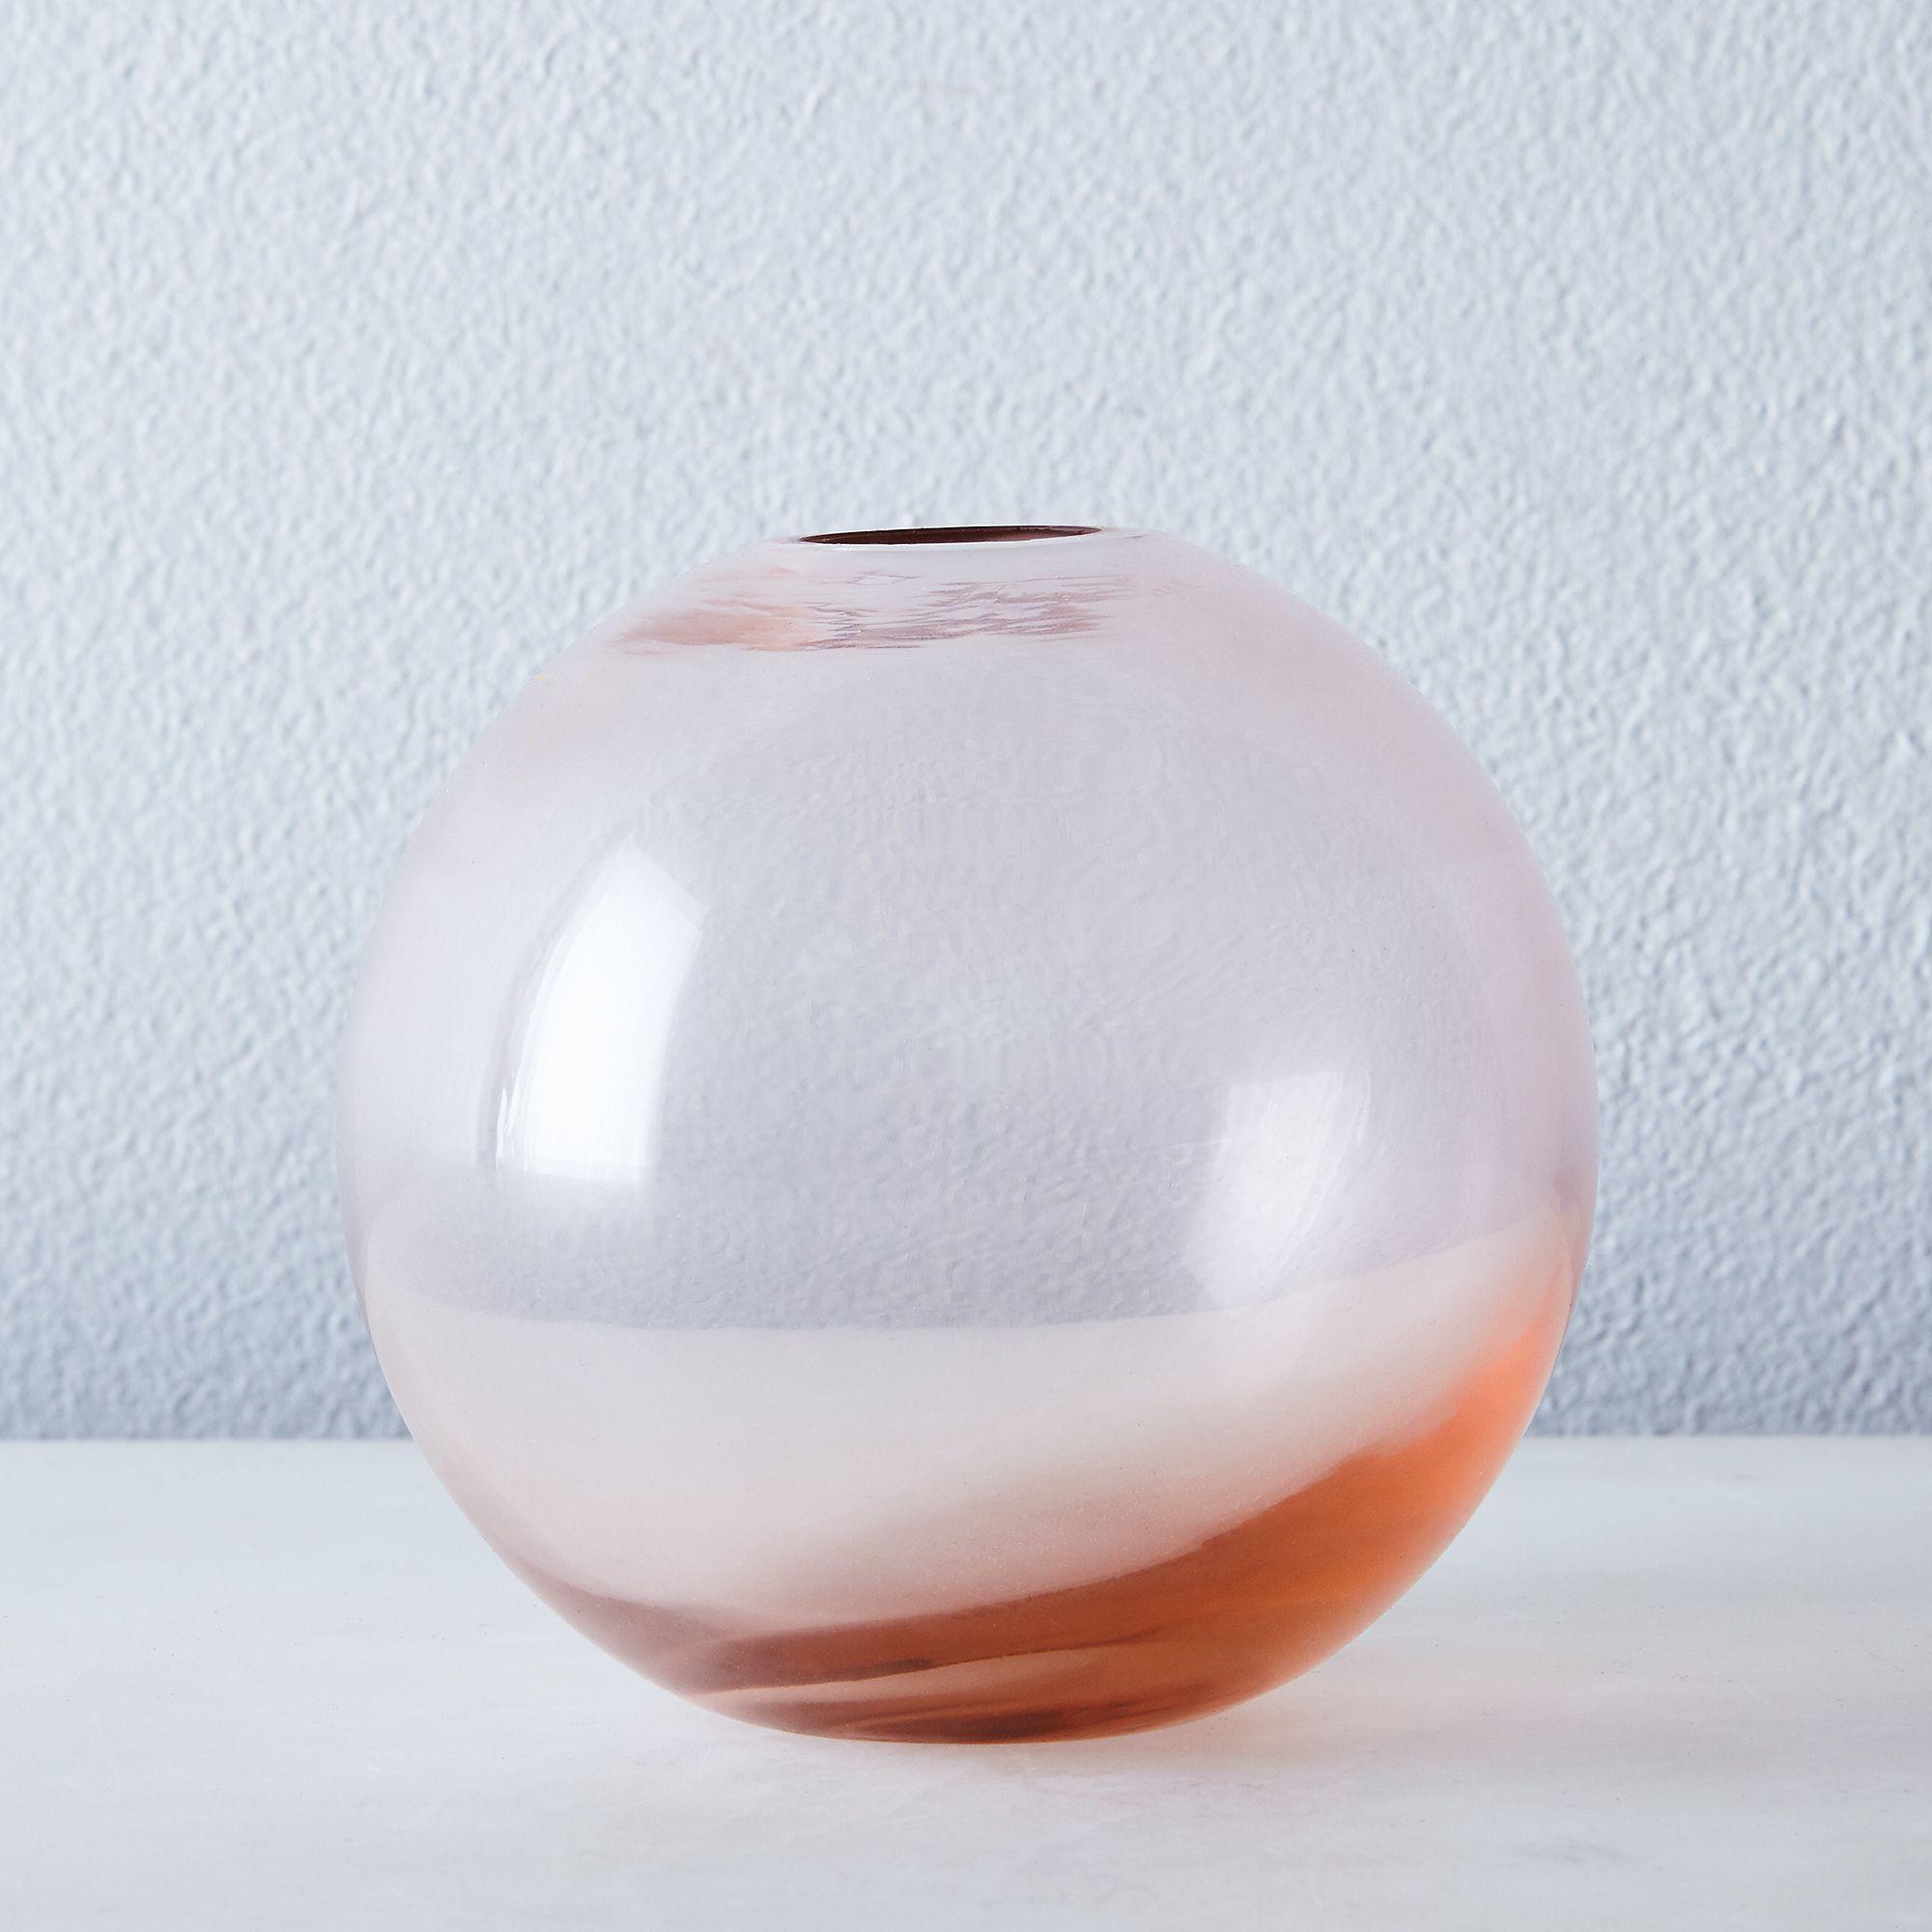 503e2763 6e52 4299 8d17 e03b62f3a8cb  2017 0703 hawkins new york aurora vase sphere pink silo rocky luten 004